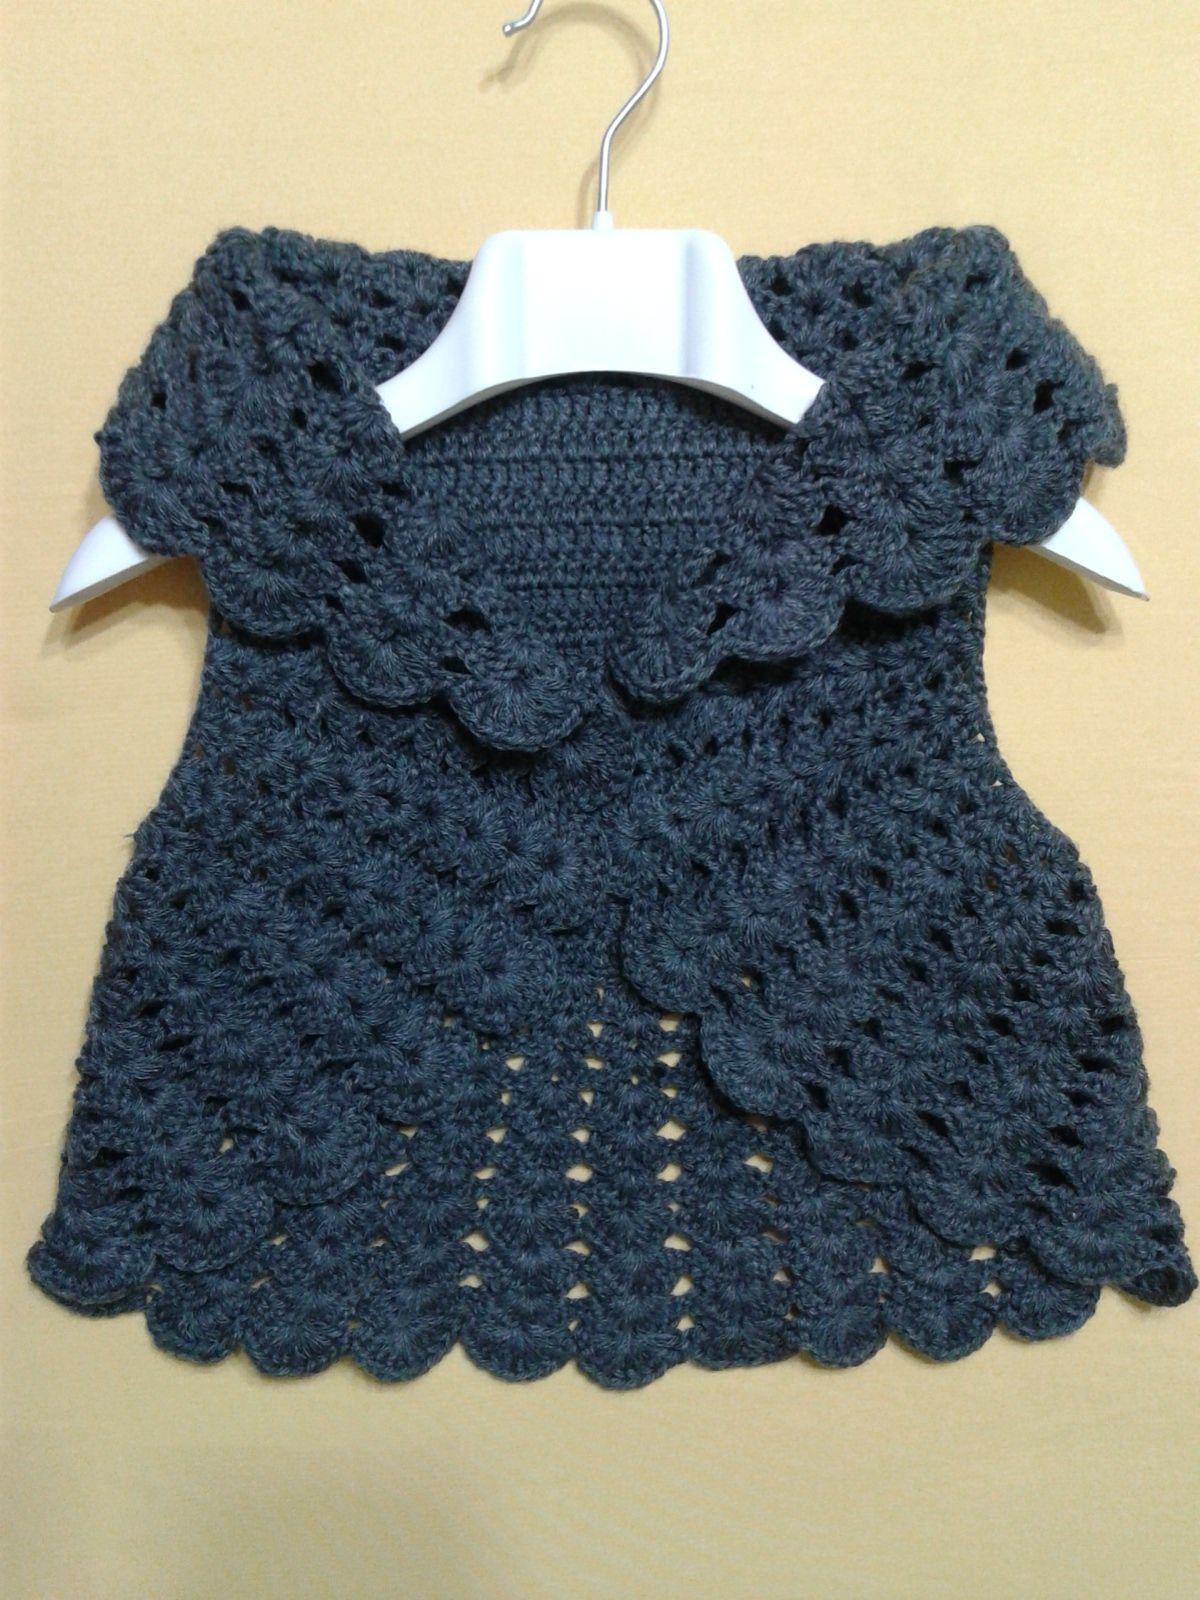 كروشيه بوليرو دائرى بأى مقاس خطوه بخطوه Crochet Circle Bolero Step By Step Crochet Baby Crochet Fashion